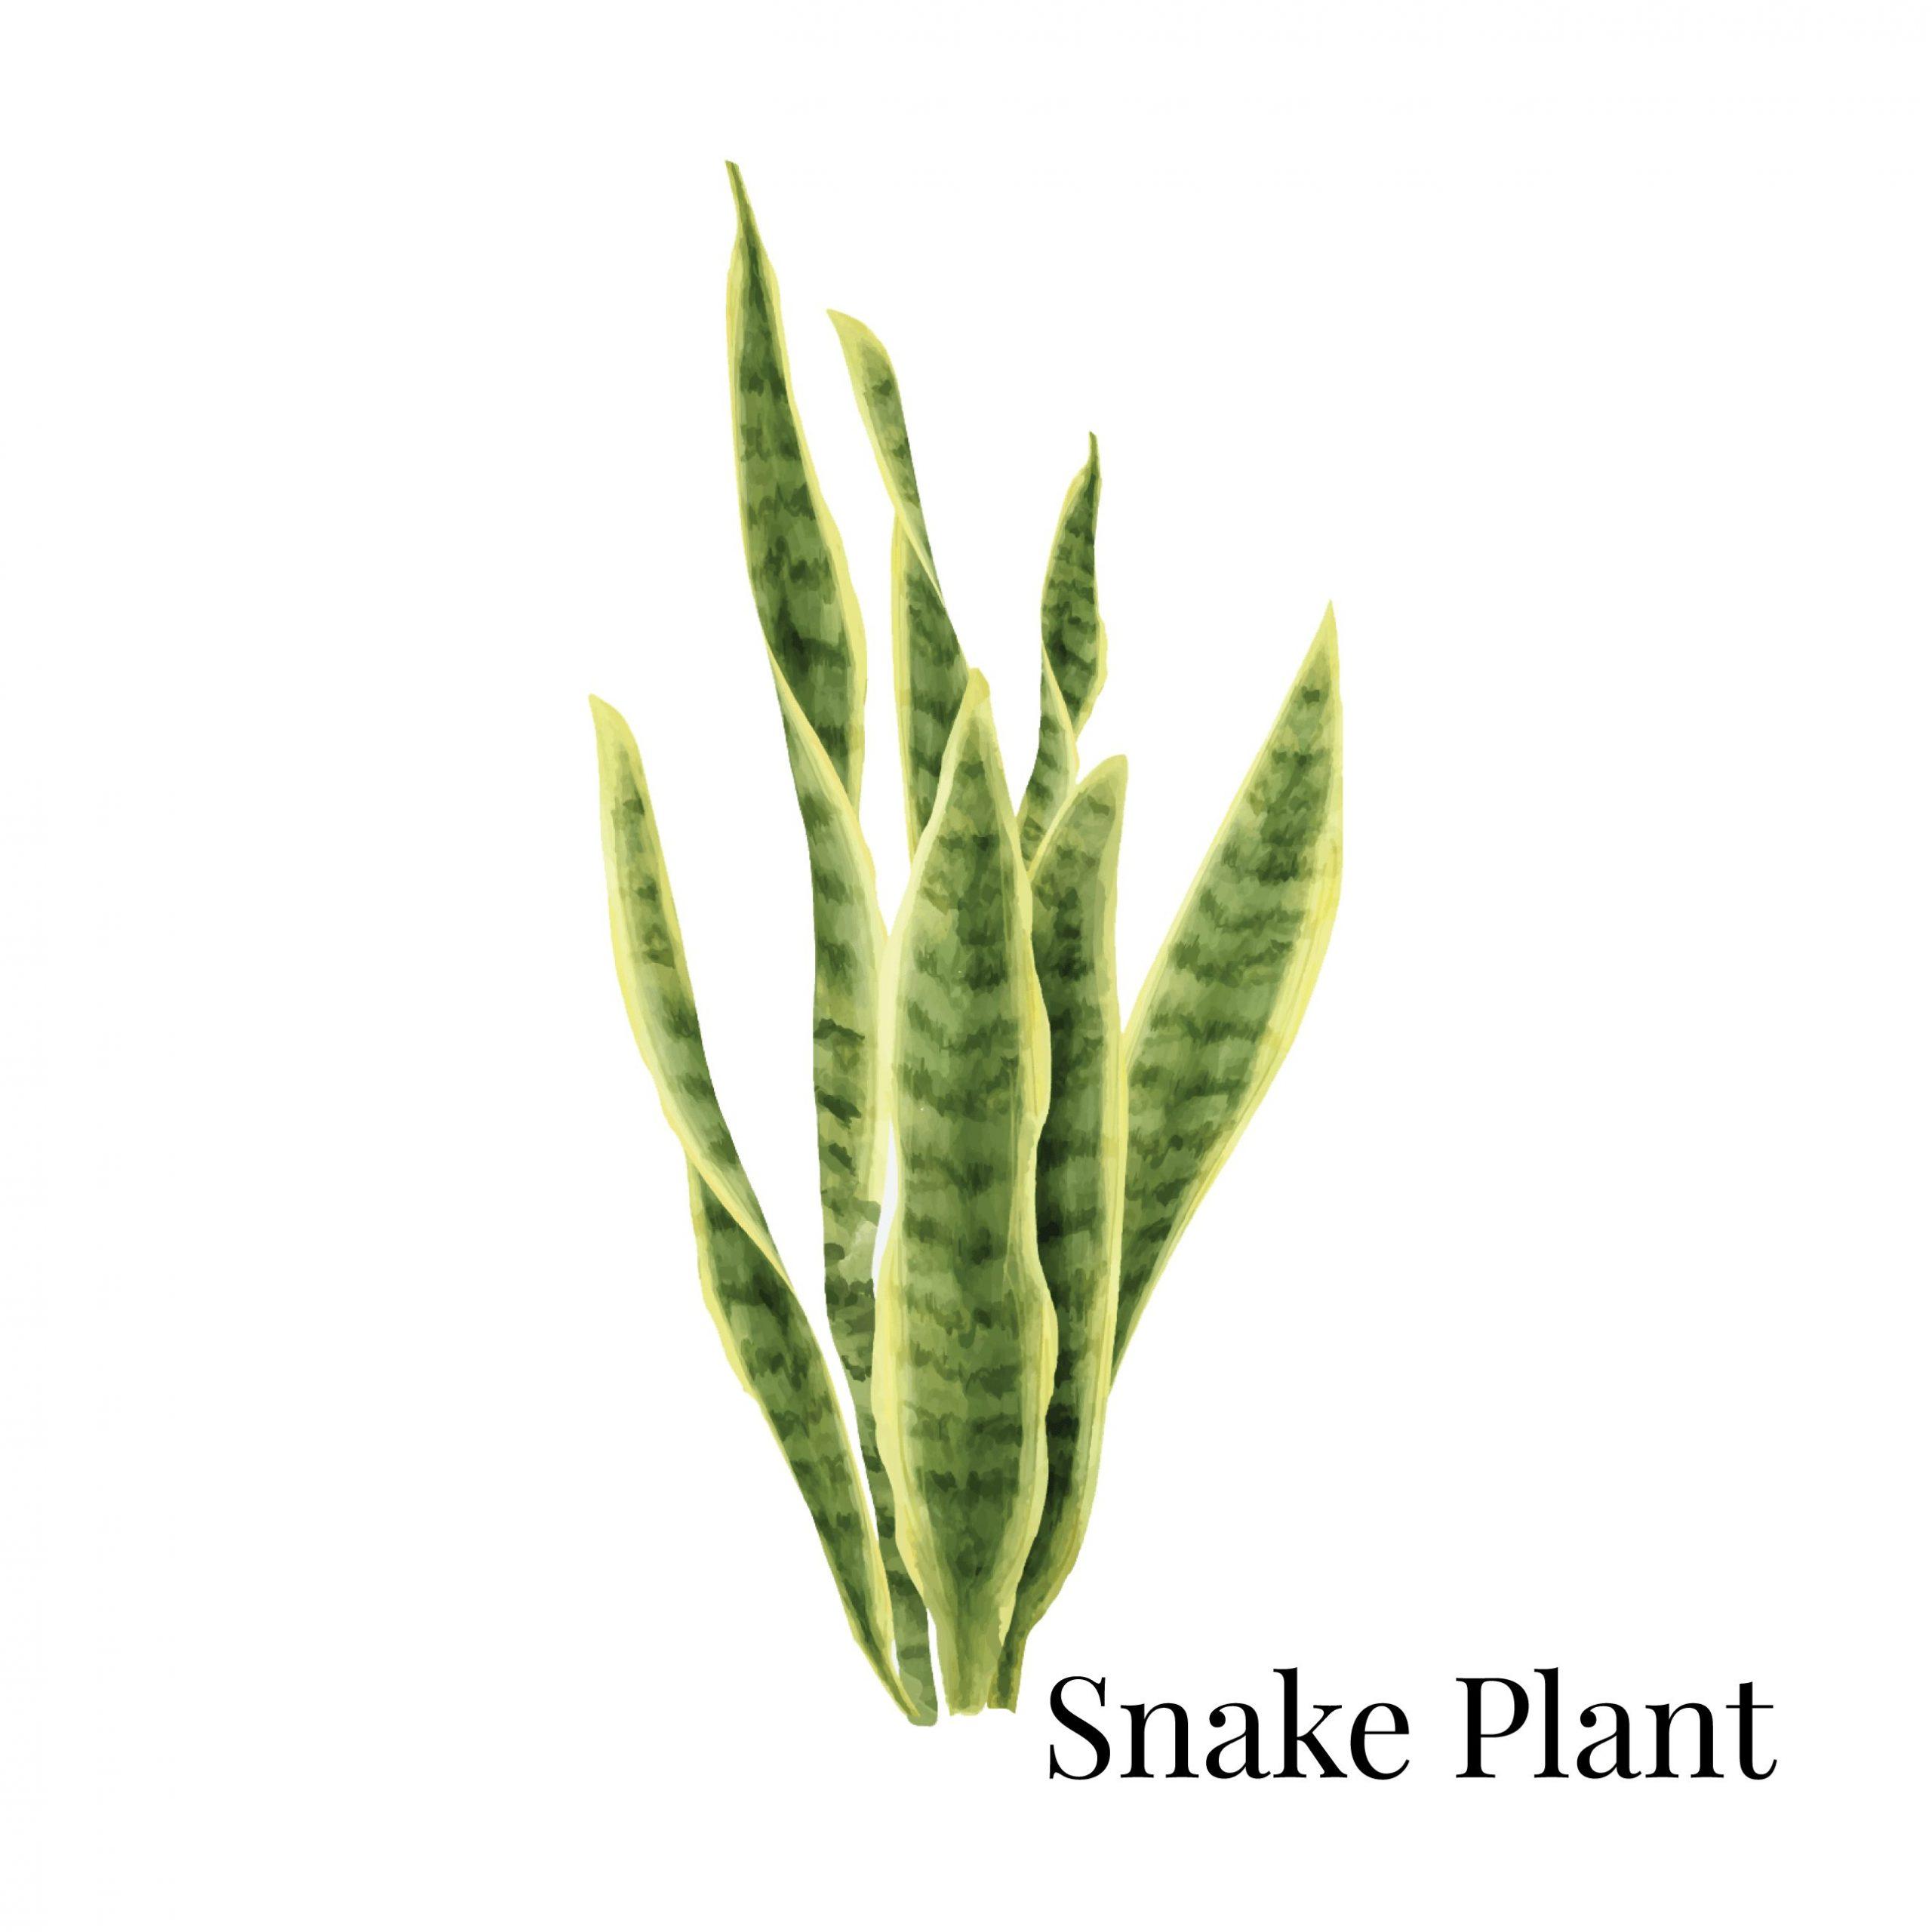 Snake Plant House Plant